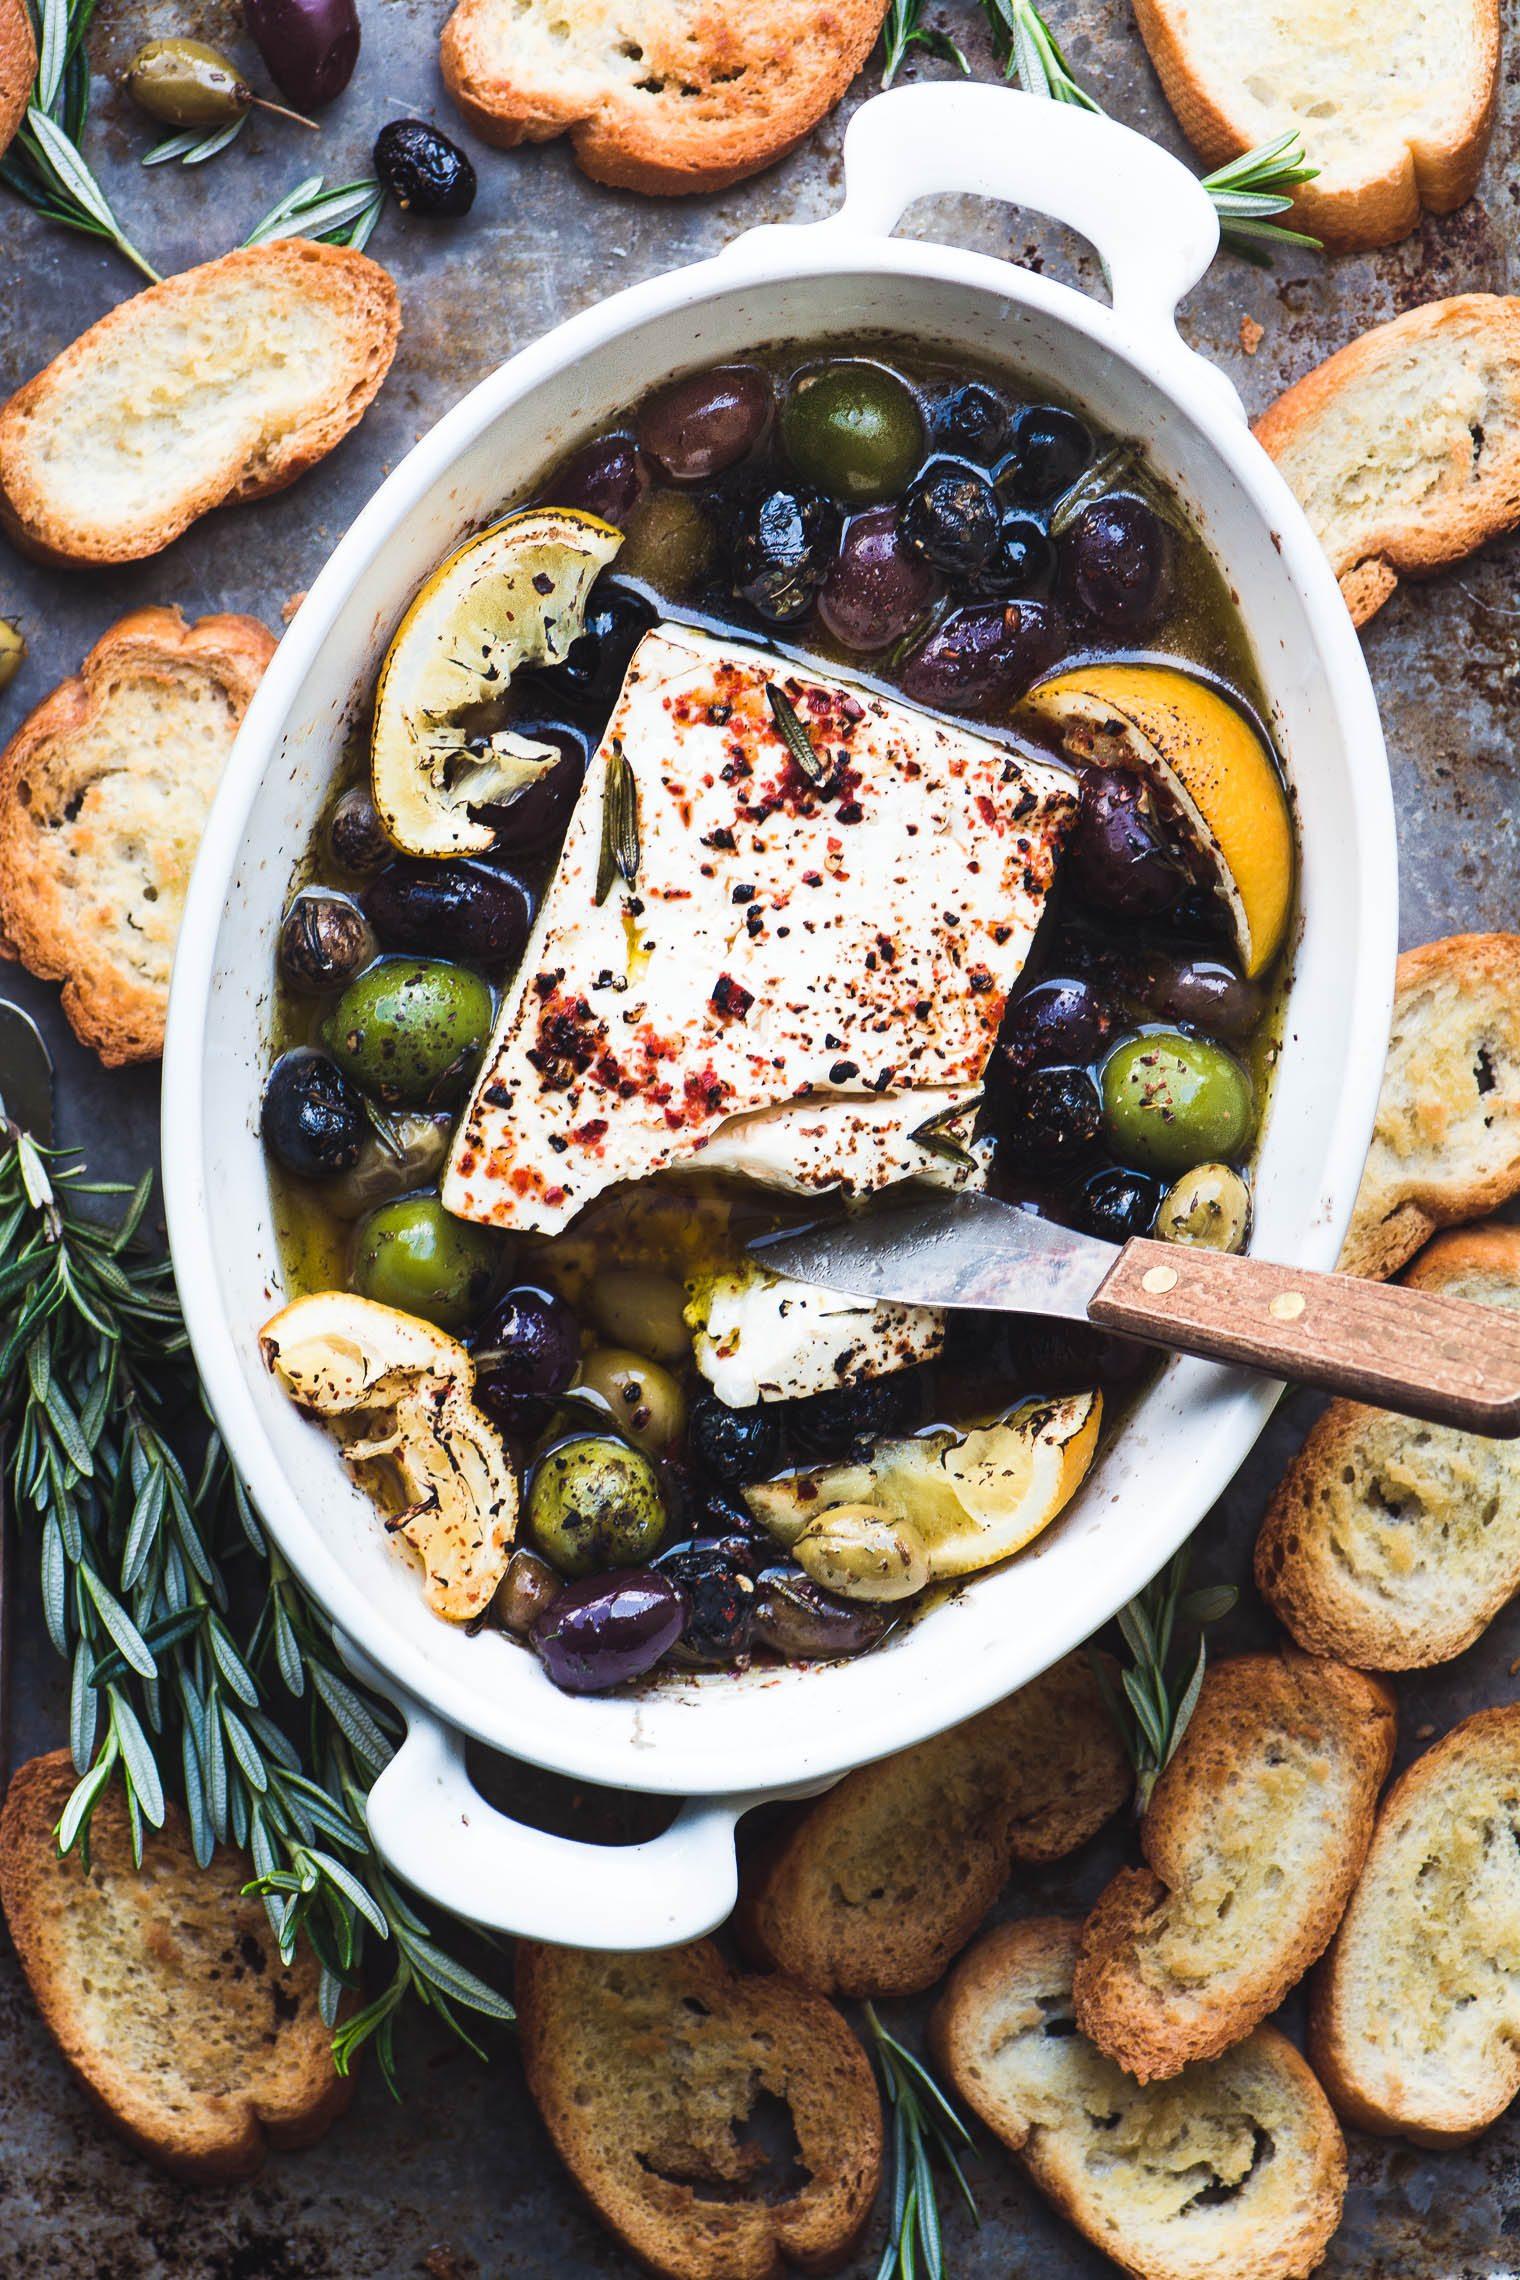 Baked Feta with Olives and Lemon